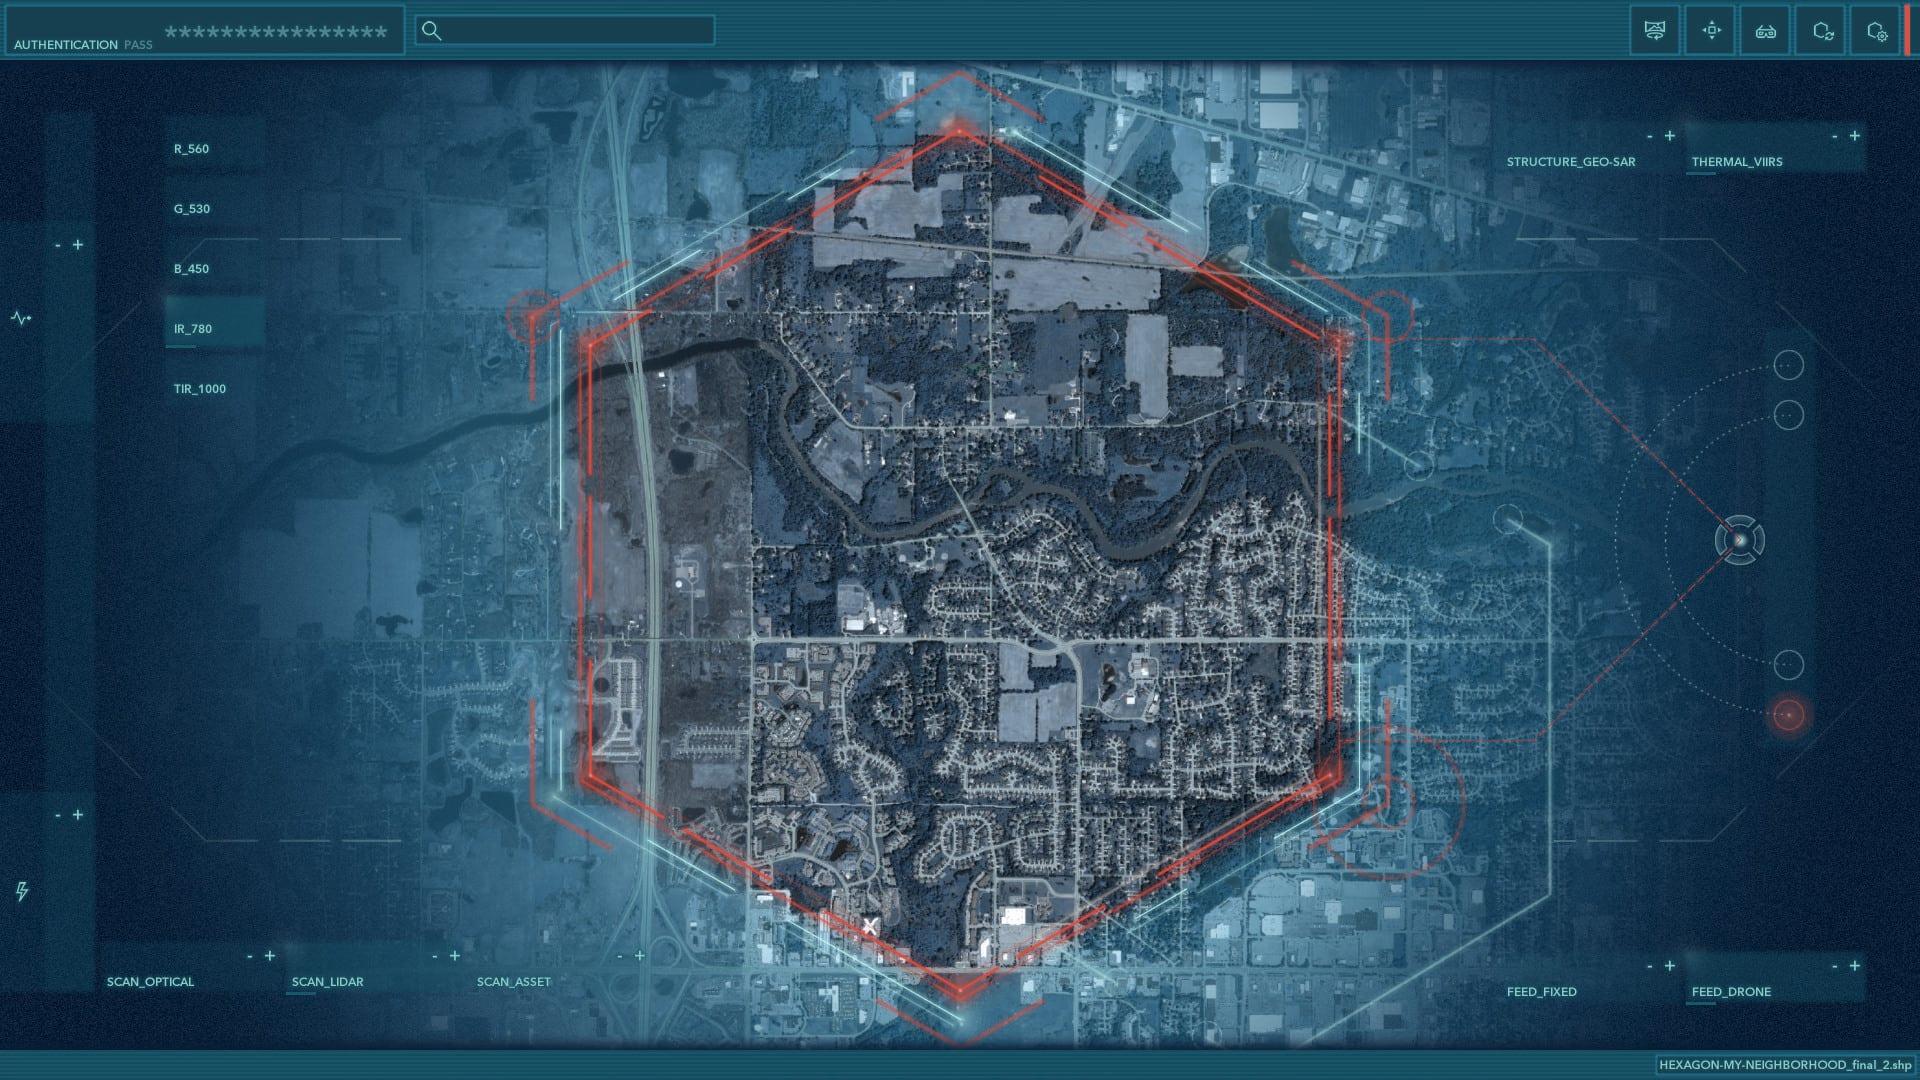 Hexagonal command center style map